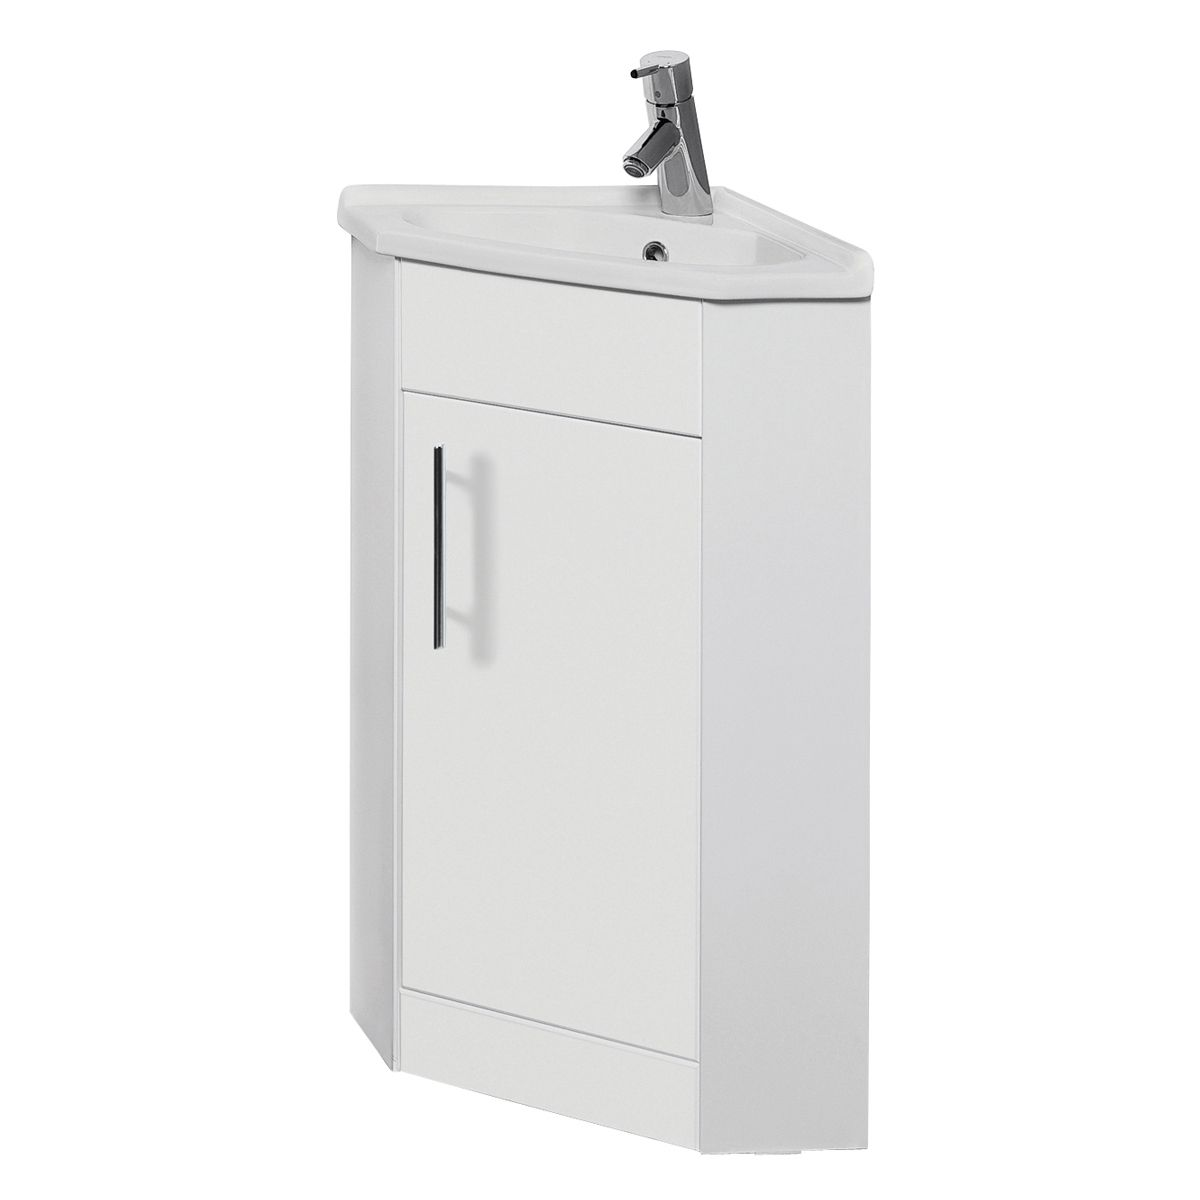 Kartell Impakt Corner Vanity Unit